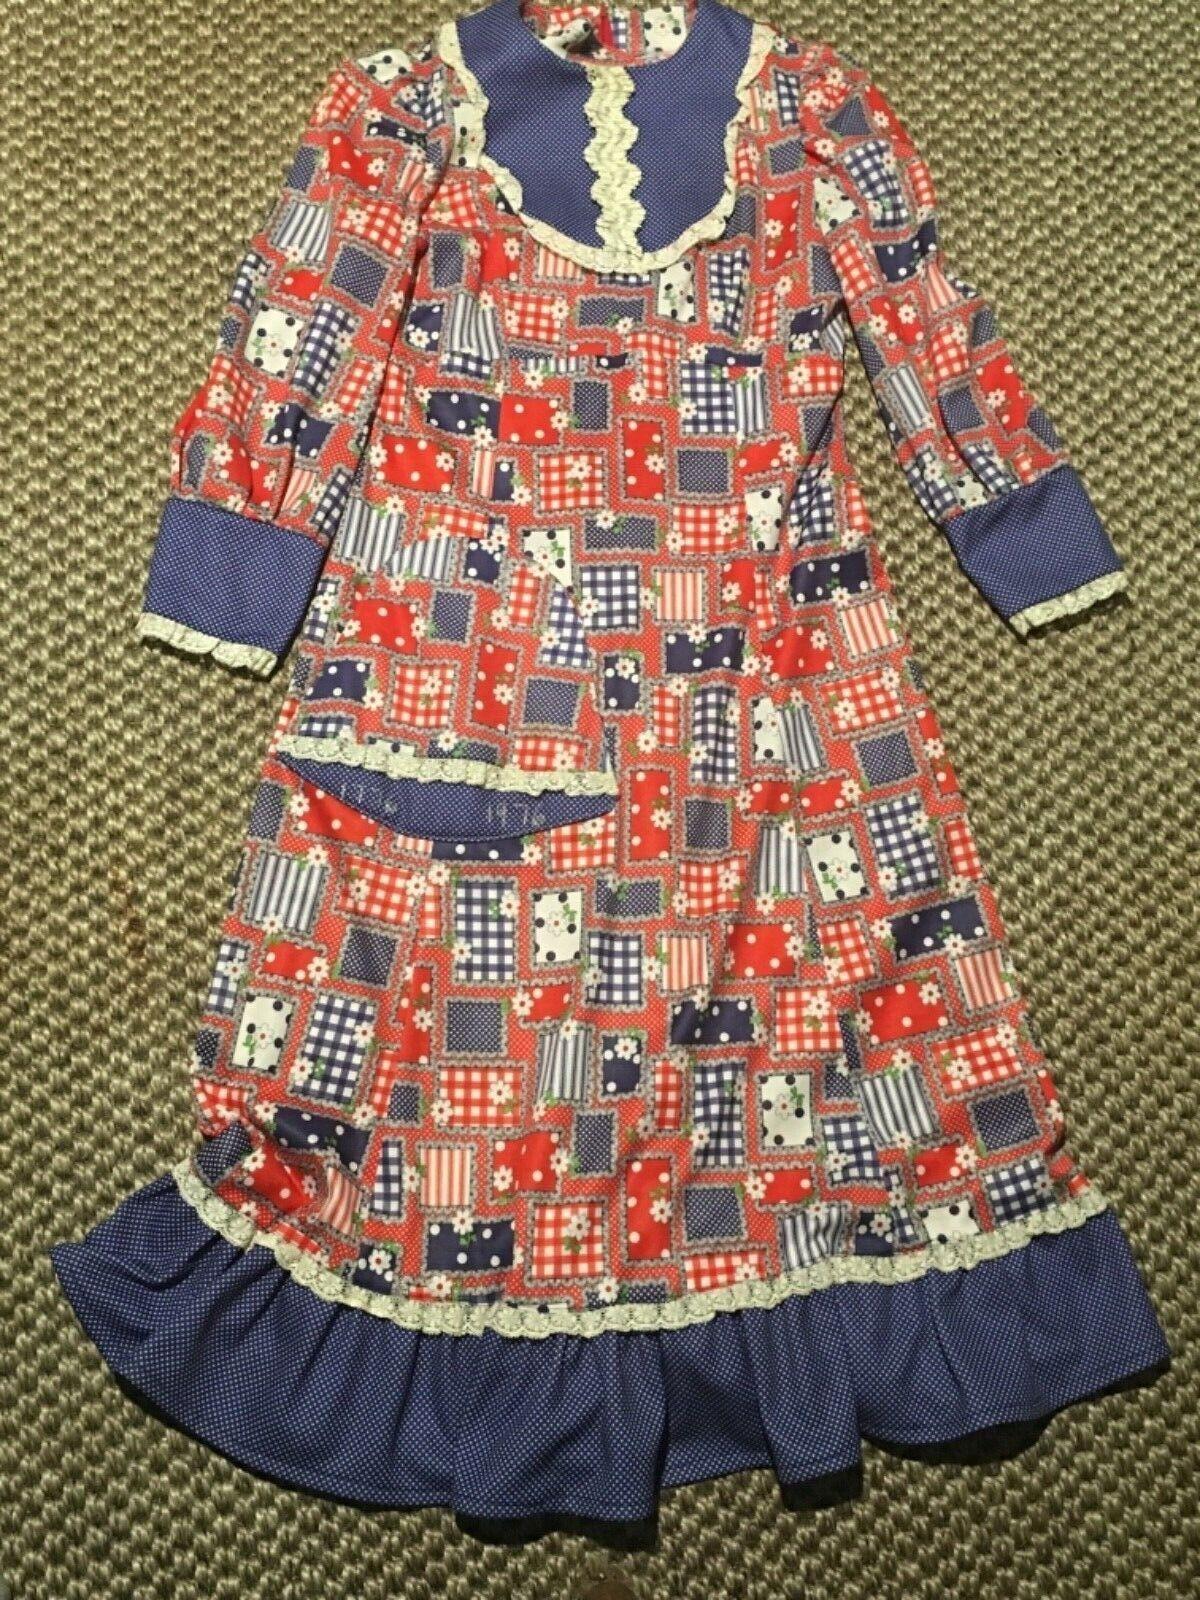 Vtg Floral gingham Patchwork lace trim ruffle Boho Hippie Maxi maiden Dress mumu